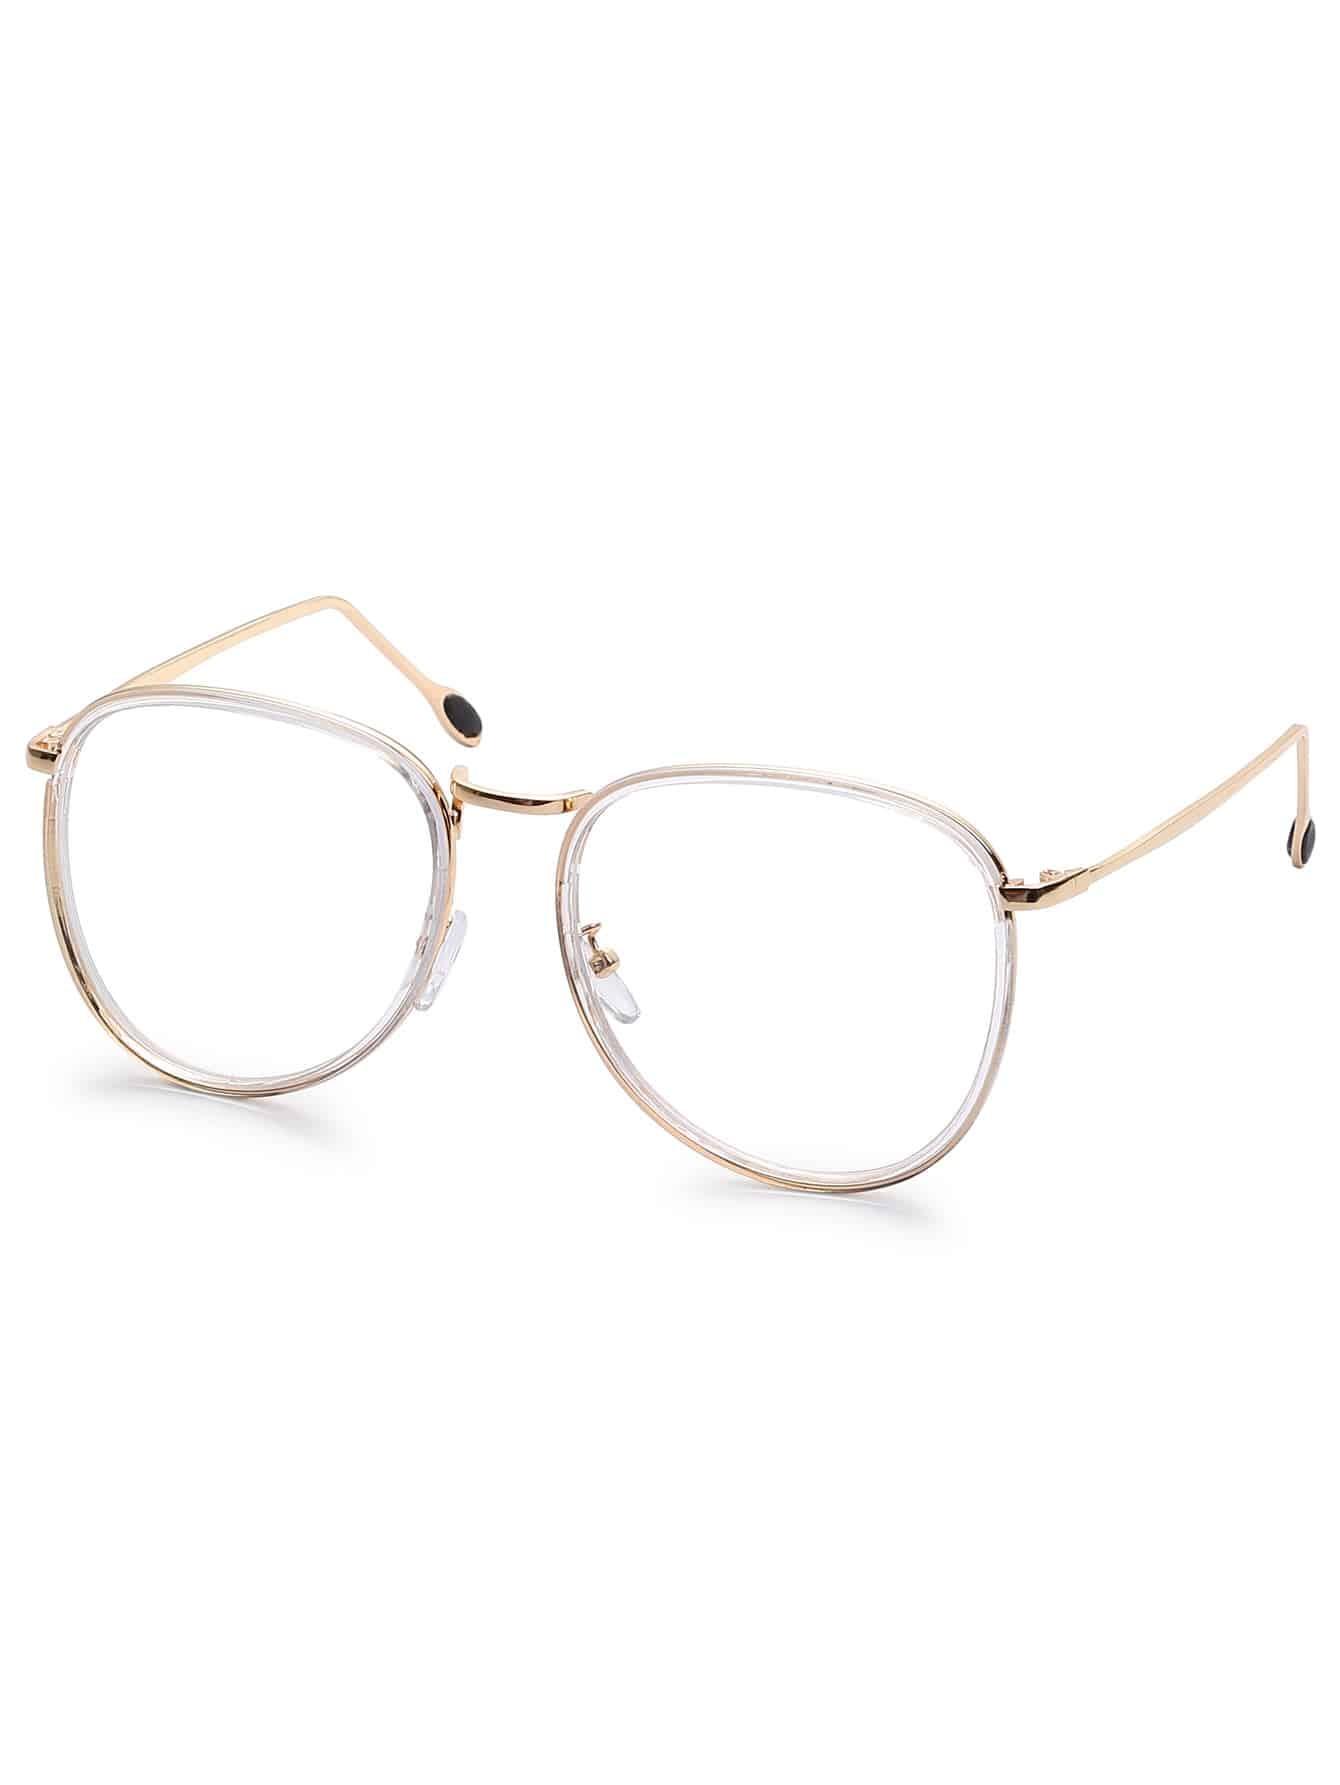 Eyeglasses frames in style - Gold Metal Frame Clear Lens Retro Style Glasses